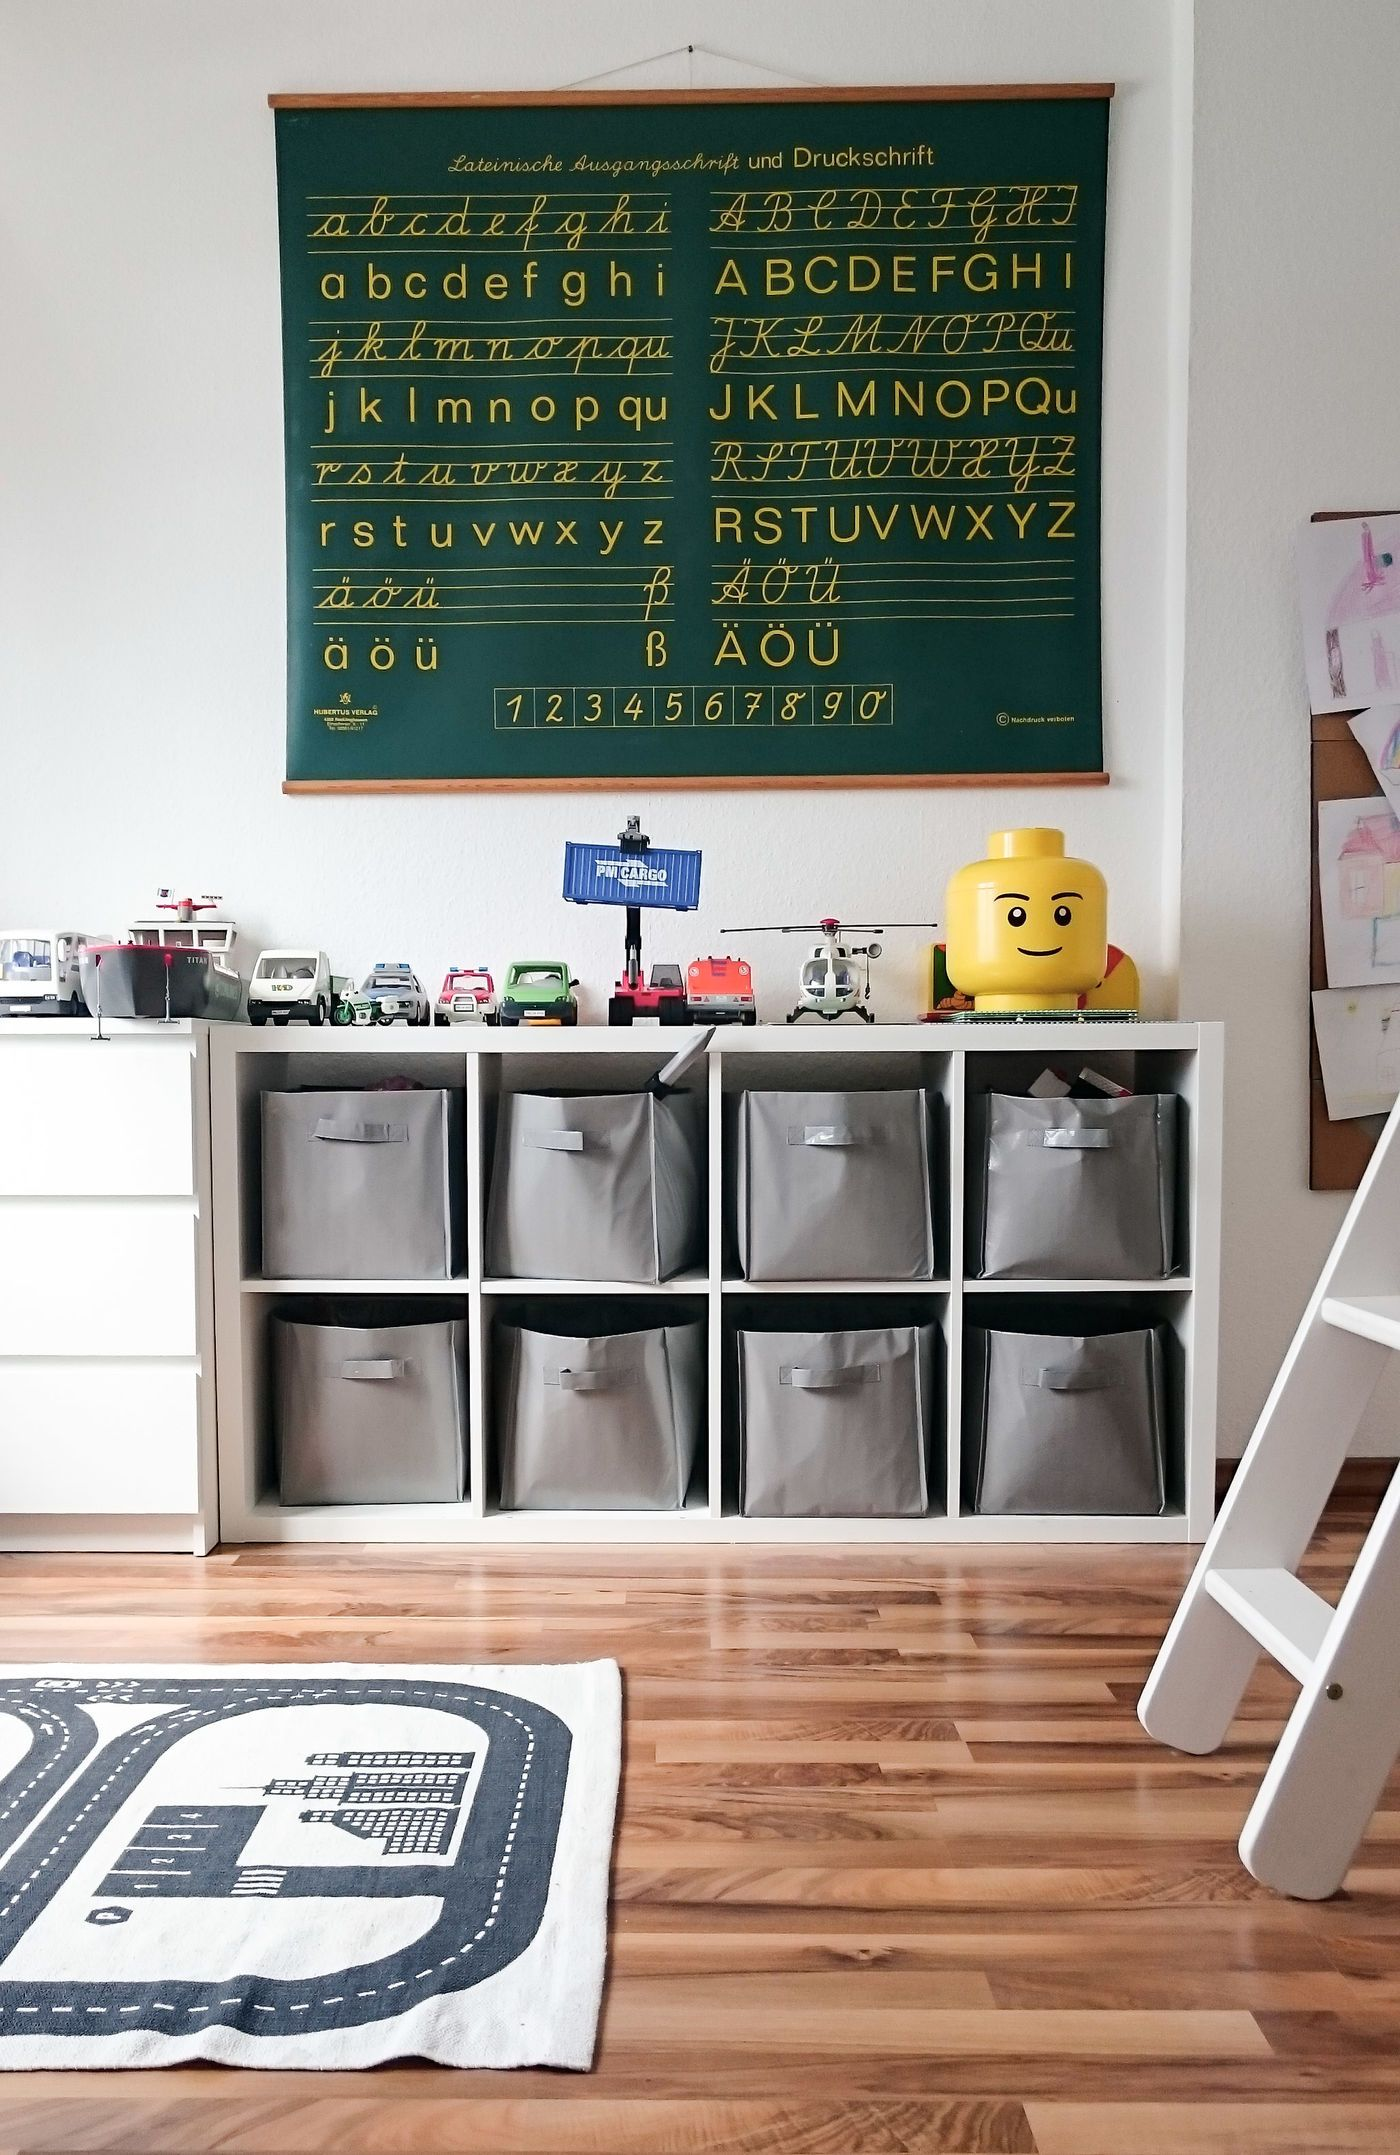 Full Size of Aufbewahrung Regal Kinderzimmer Ikea Gebraucht Aufbewahrungskorb Mint Ideen Aufbewahrungssystem Aufbewahrungsregal Gross Aufbewahrungsboxen Aufbewahrungsbox Fr Kinderzimmer Kinderzimmer Aufbewahrung